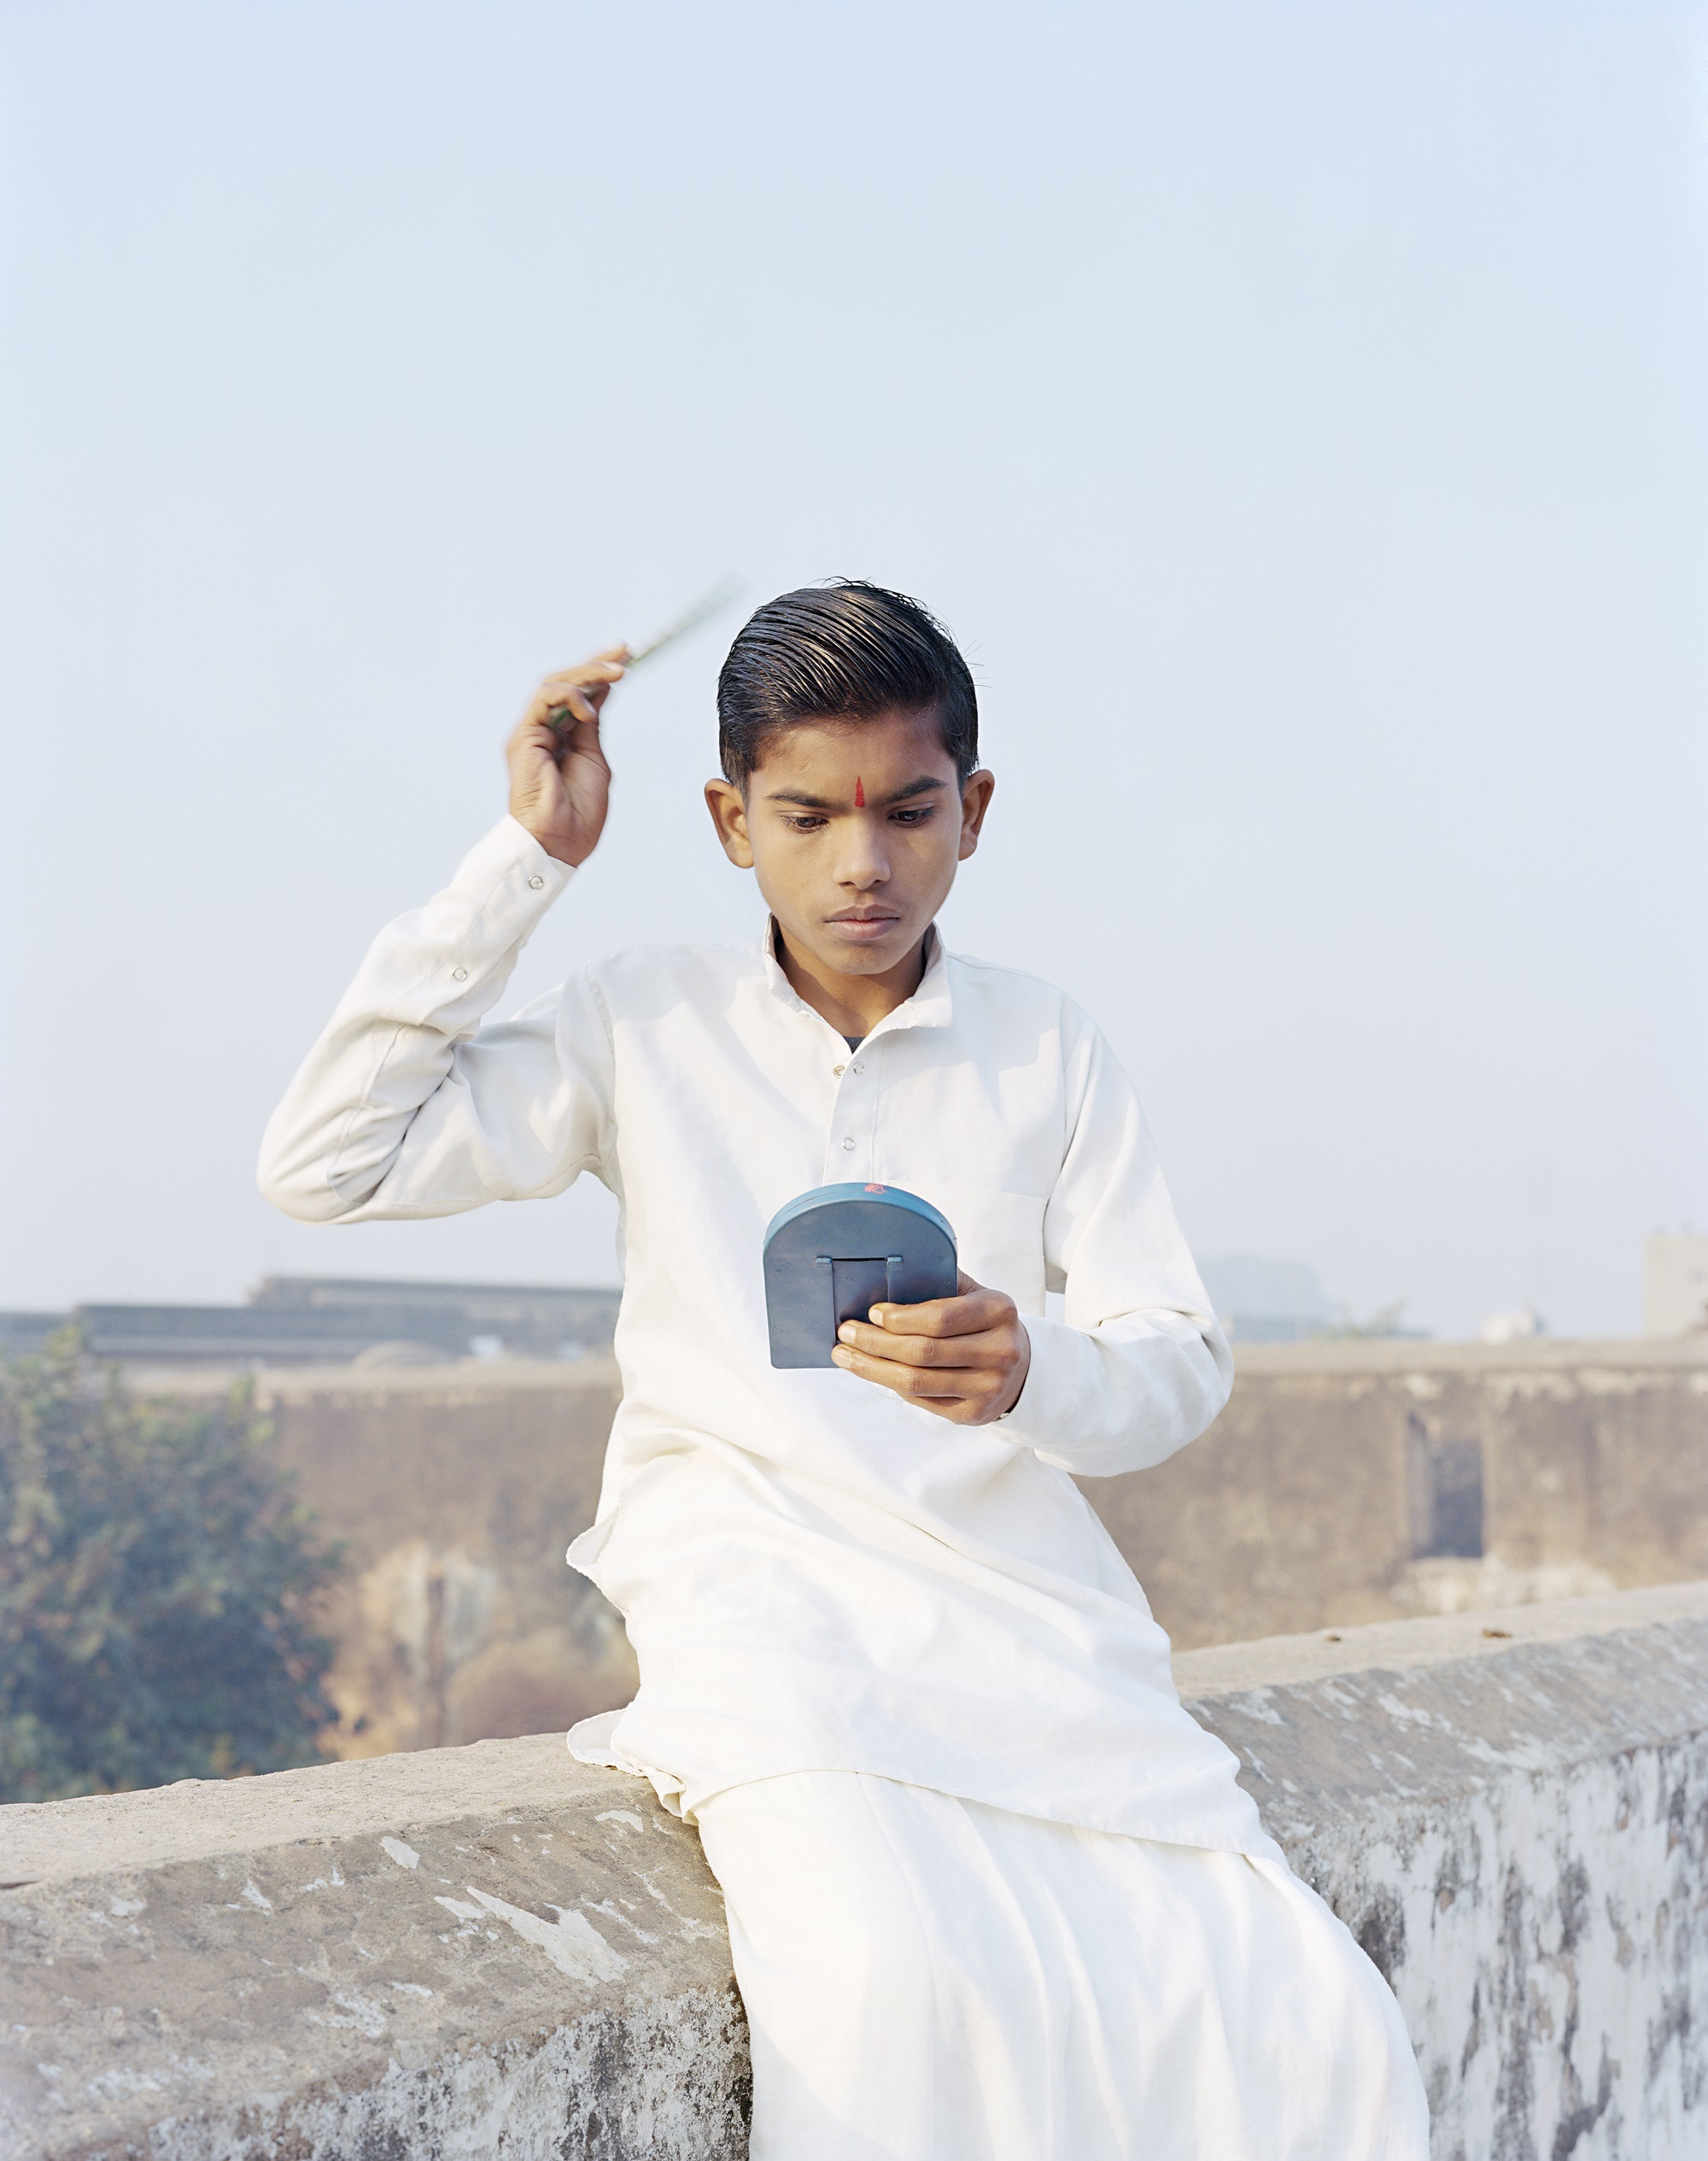 Rama Combing His Hair, Ayodhya, India, 2015 (C)Vasantha Yogananthan